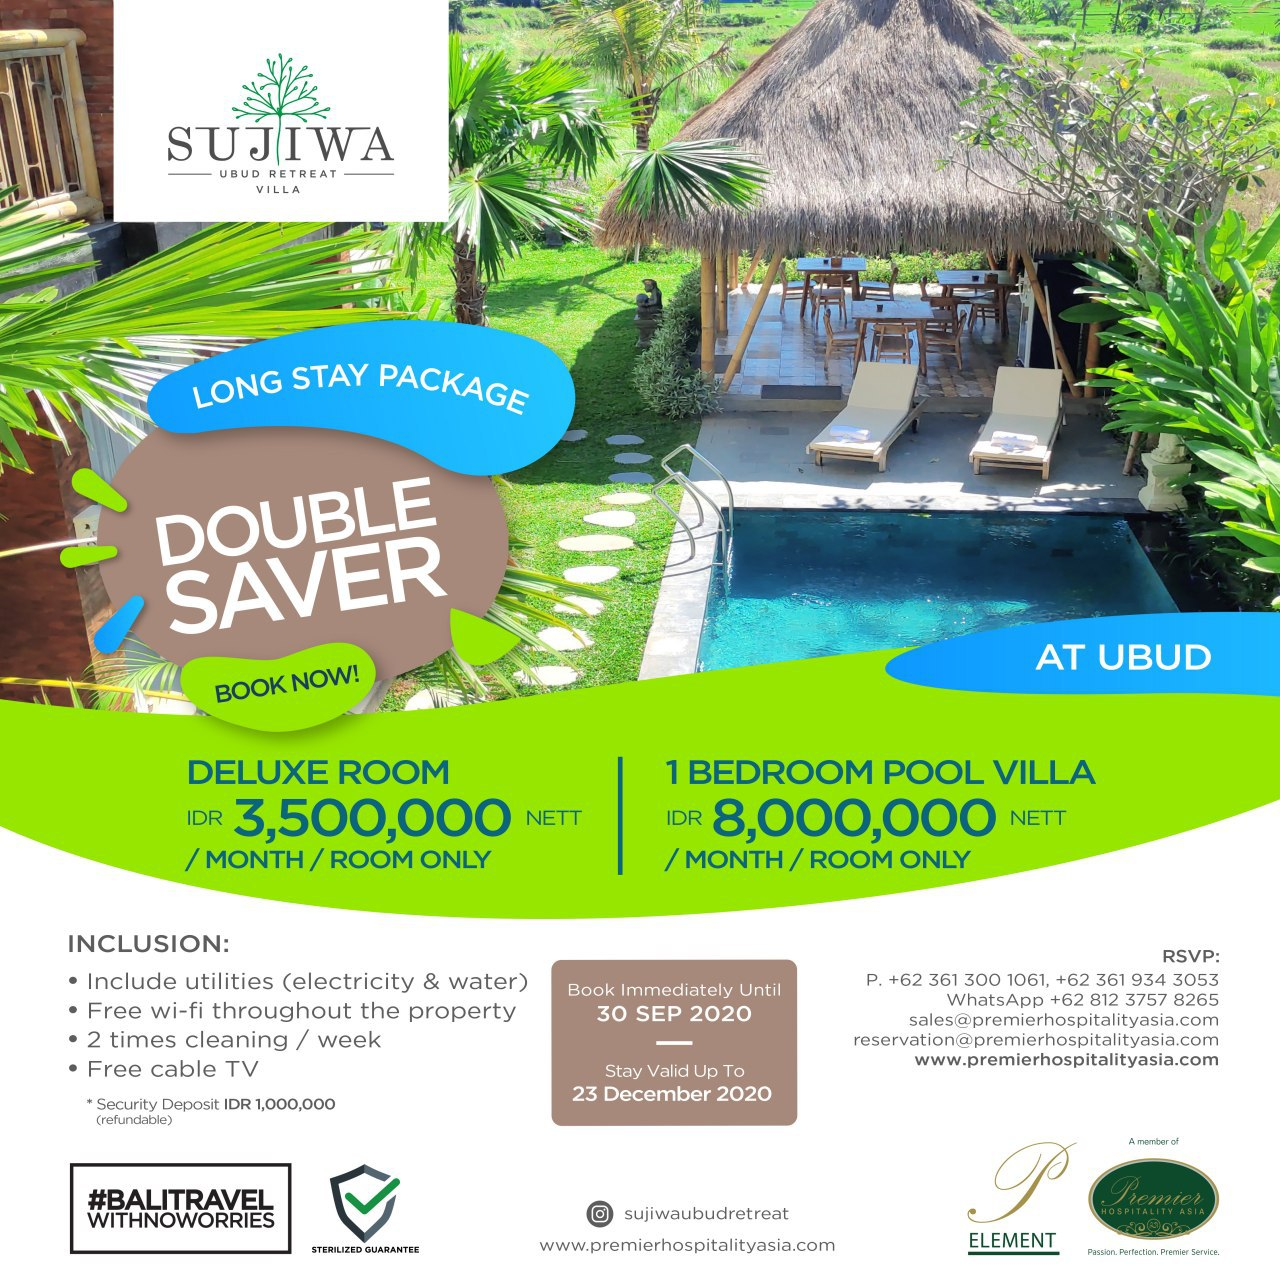 sujiwa-ubud-retreat-bali-long-stay-long-term-package-bali-cheap-accommodation-by-premier-hospitality-asia-monthly-rental